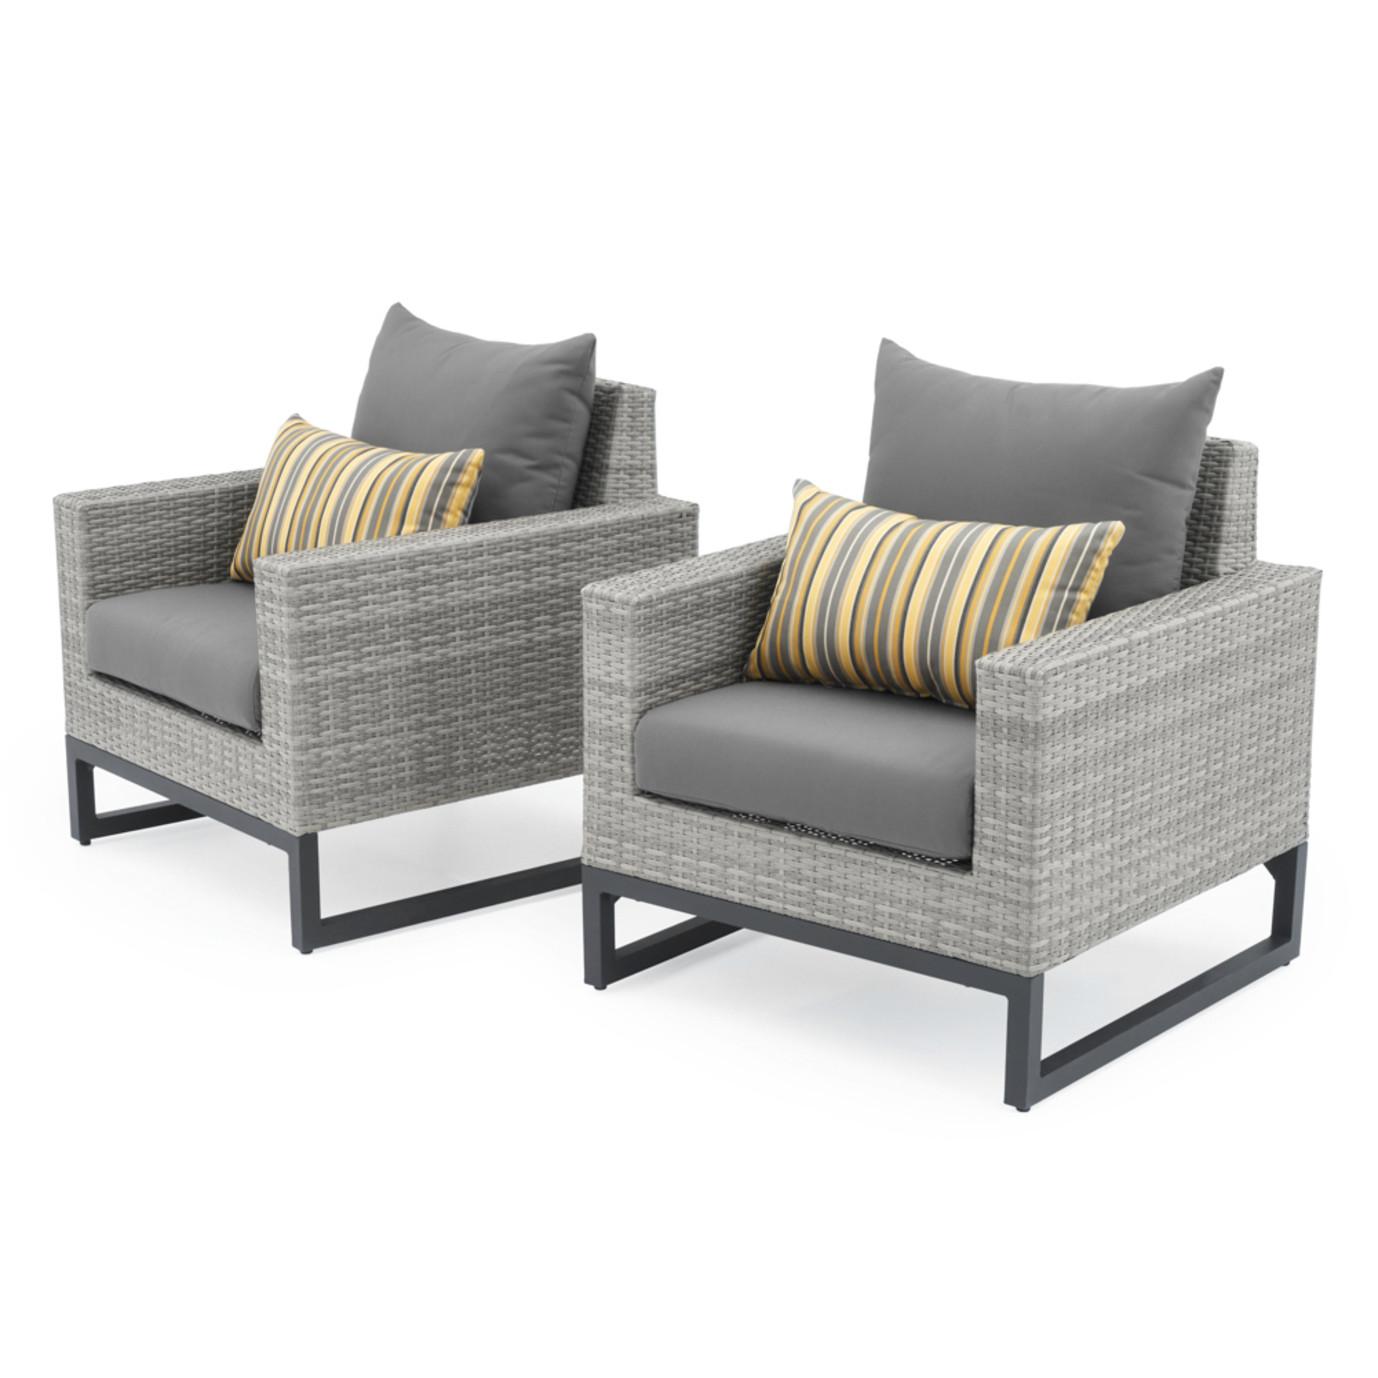 Milo™ Gray Club Chairs - Charcoal Gray